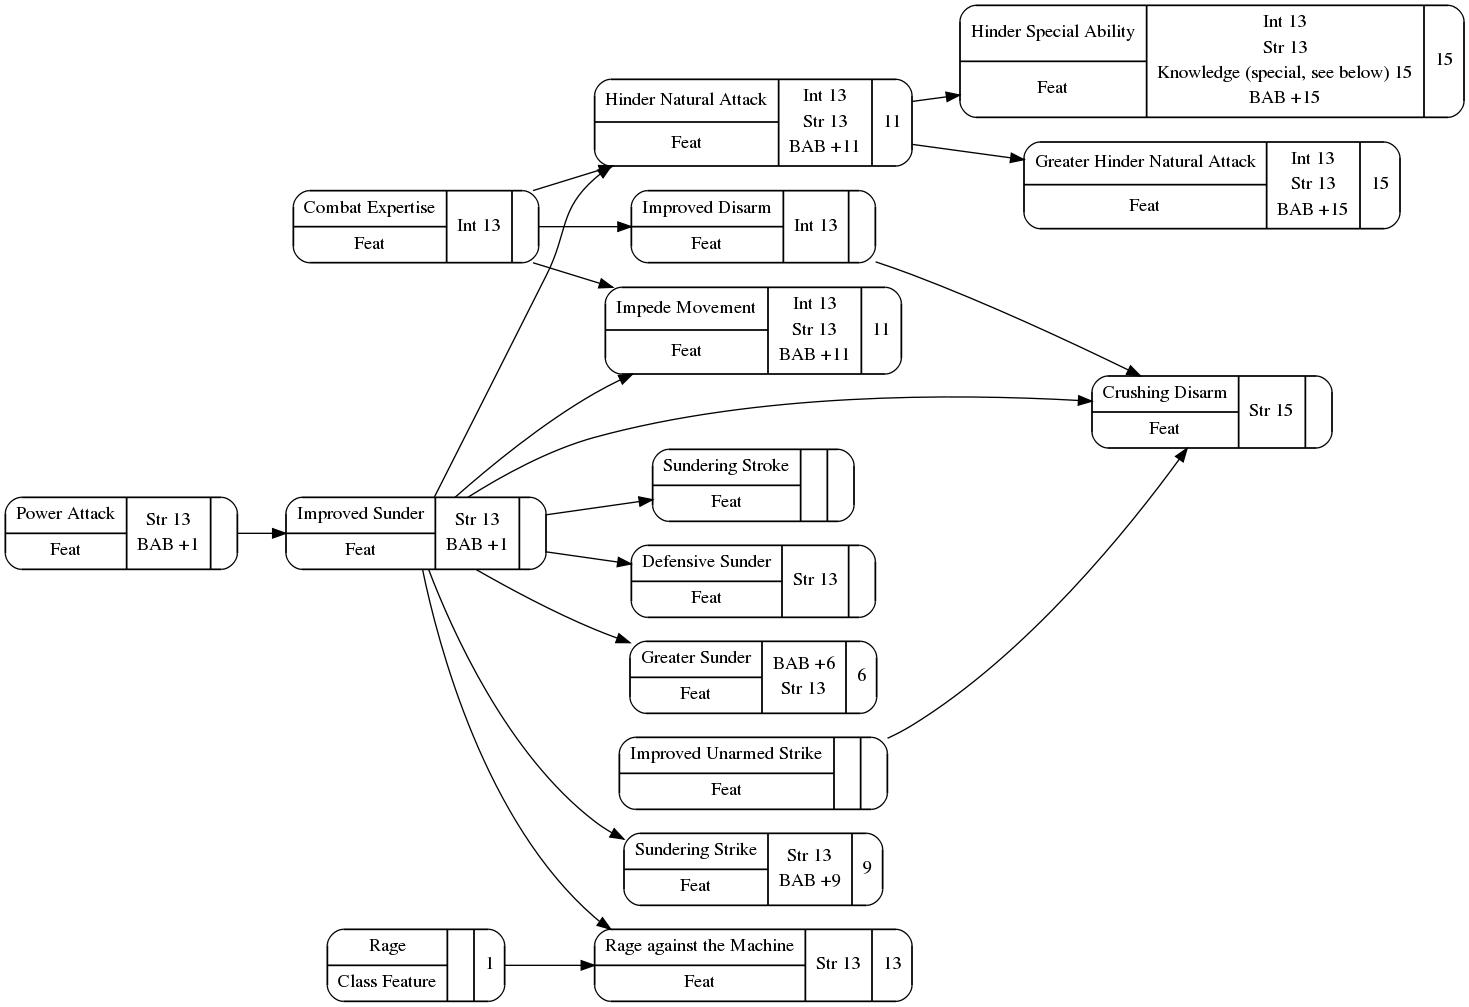 Improved Sunder feat diagram